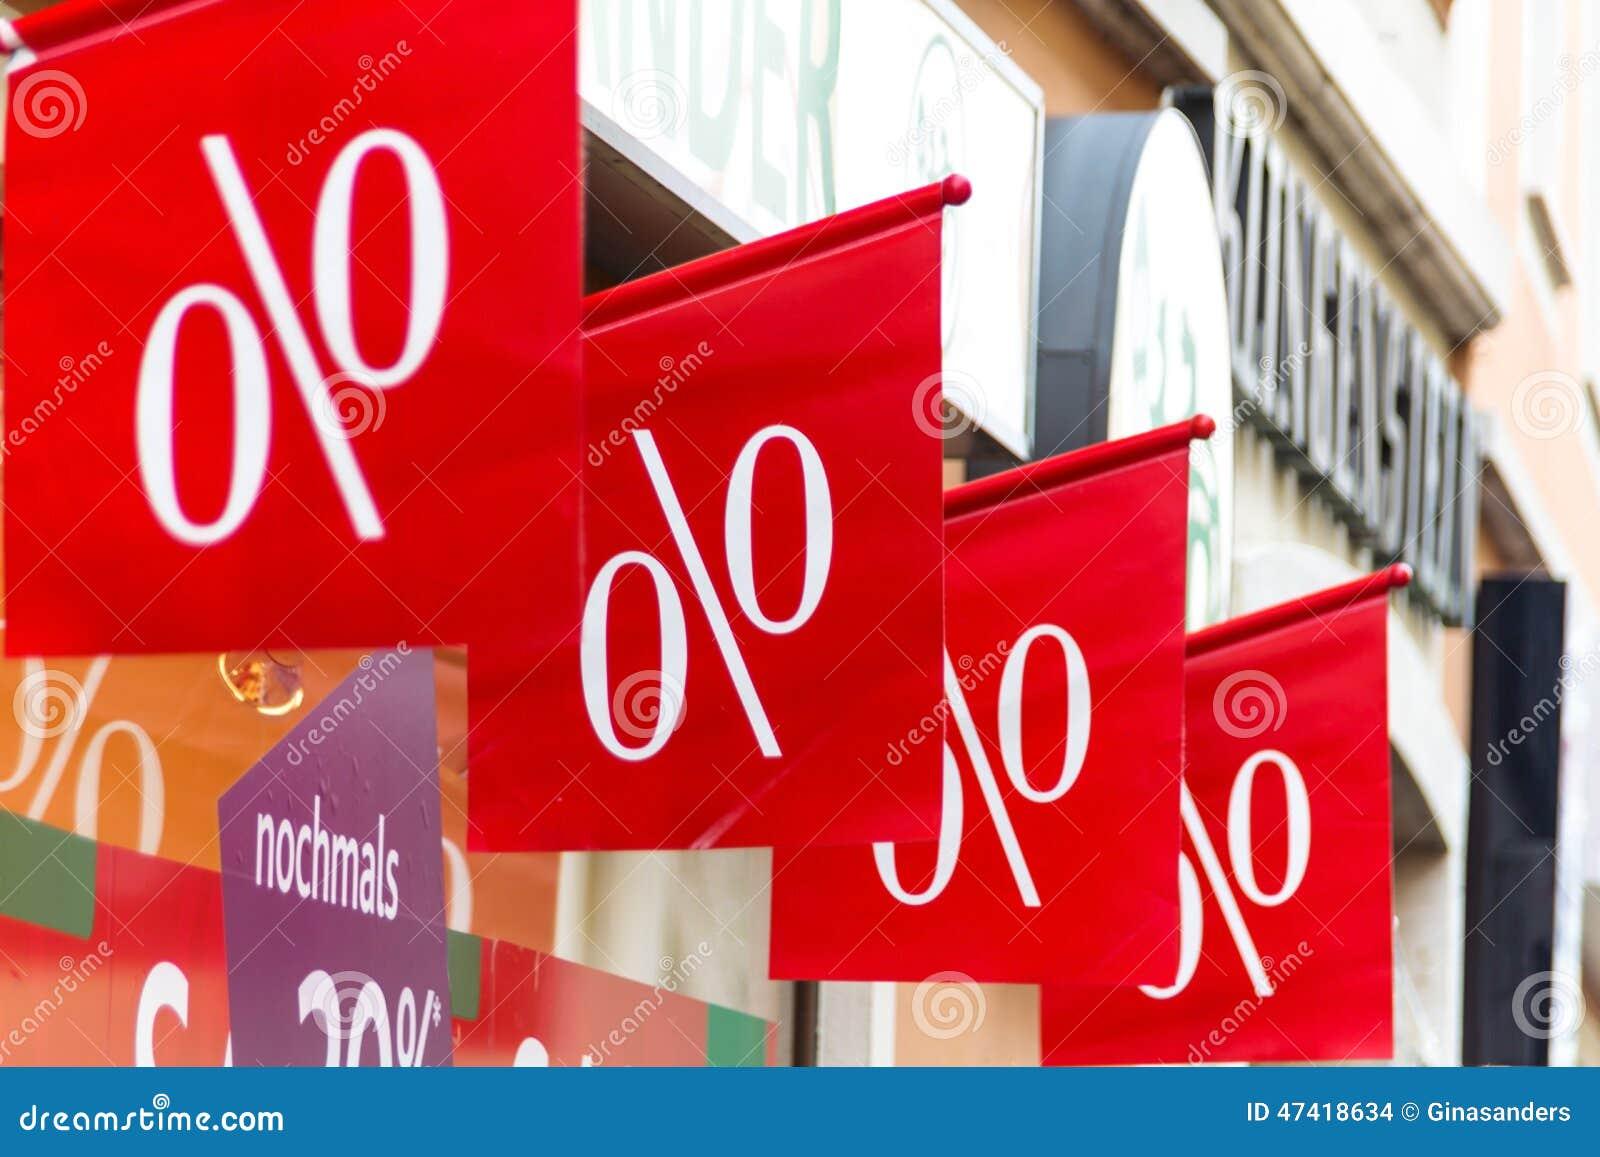 Retail price reduction in percent